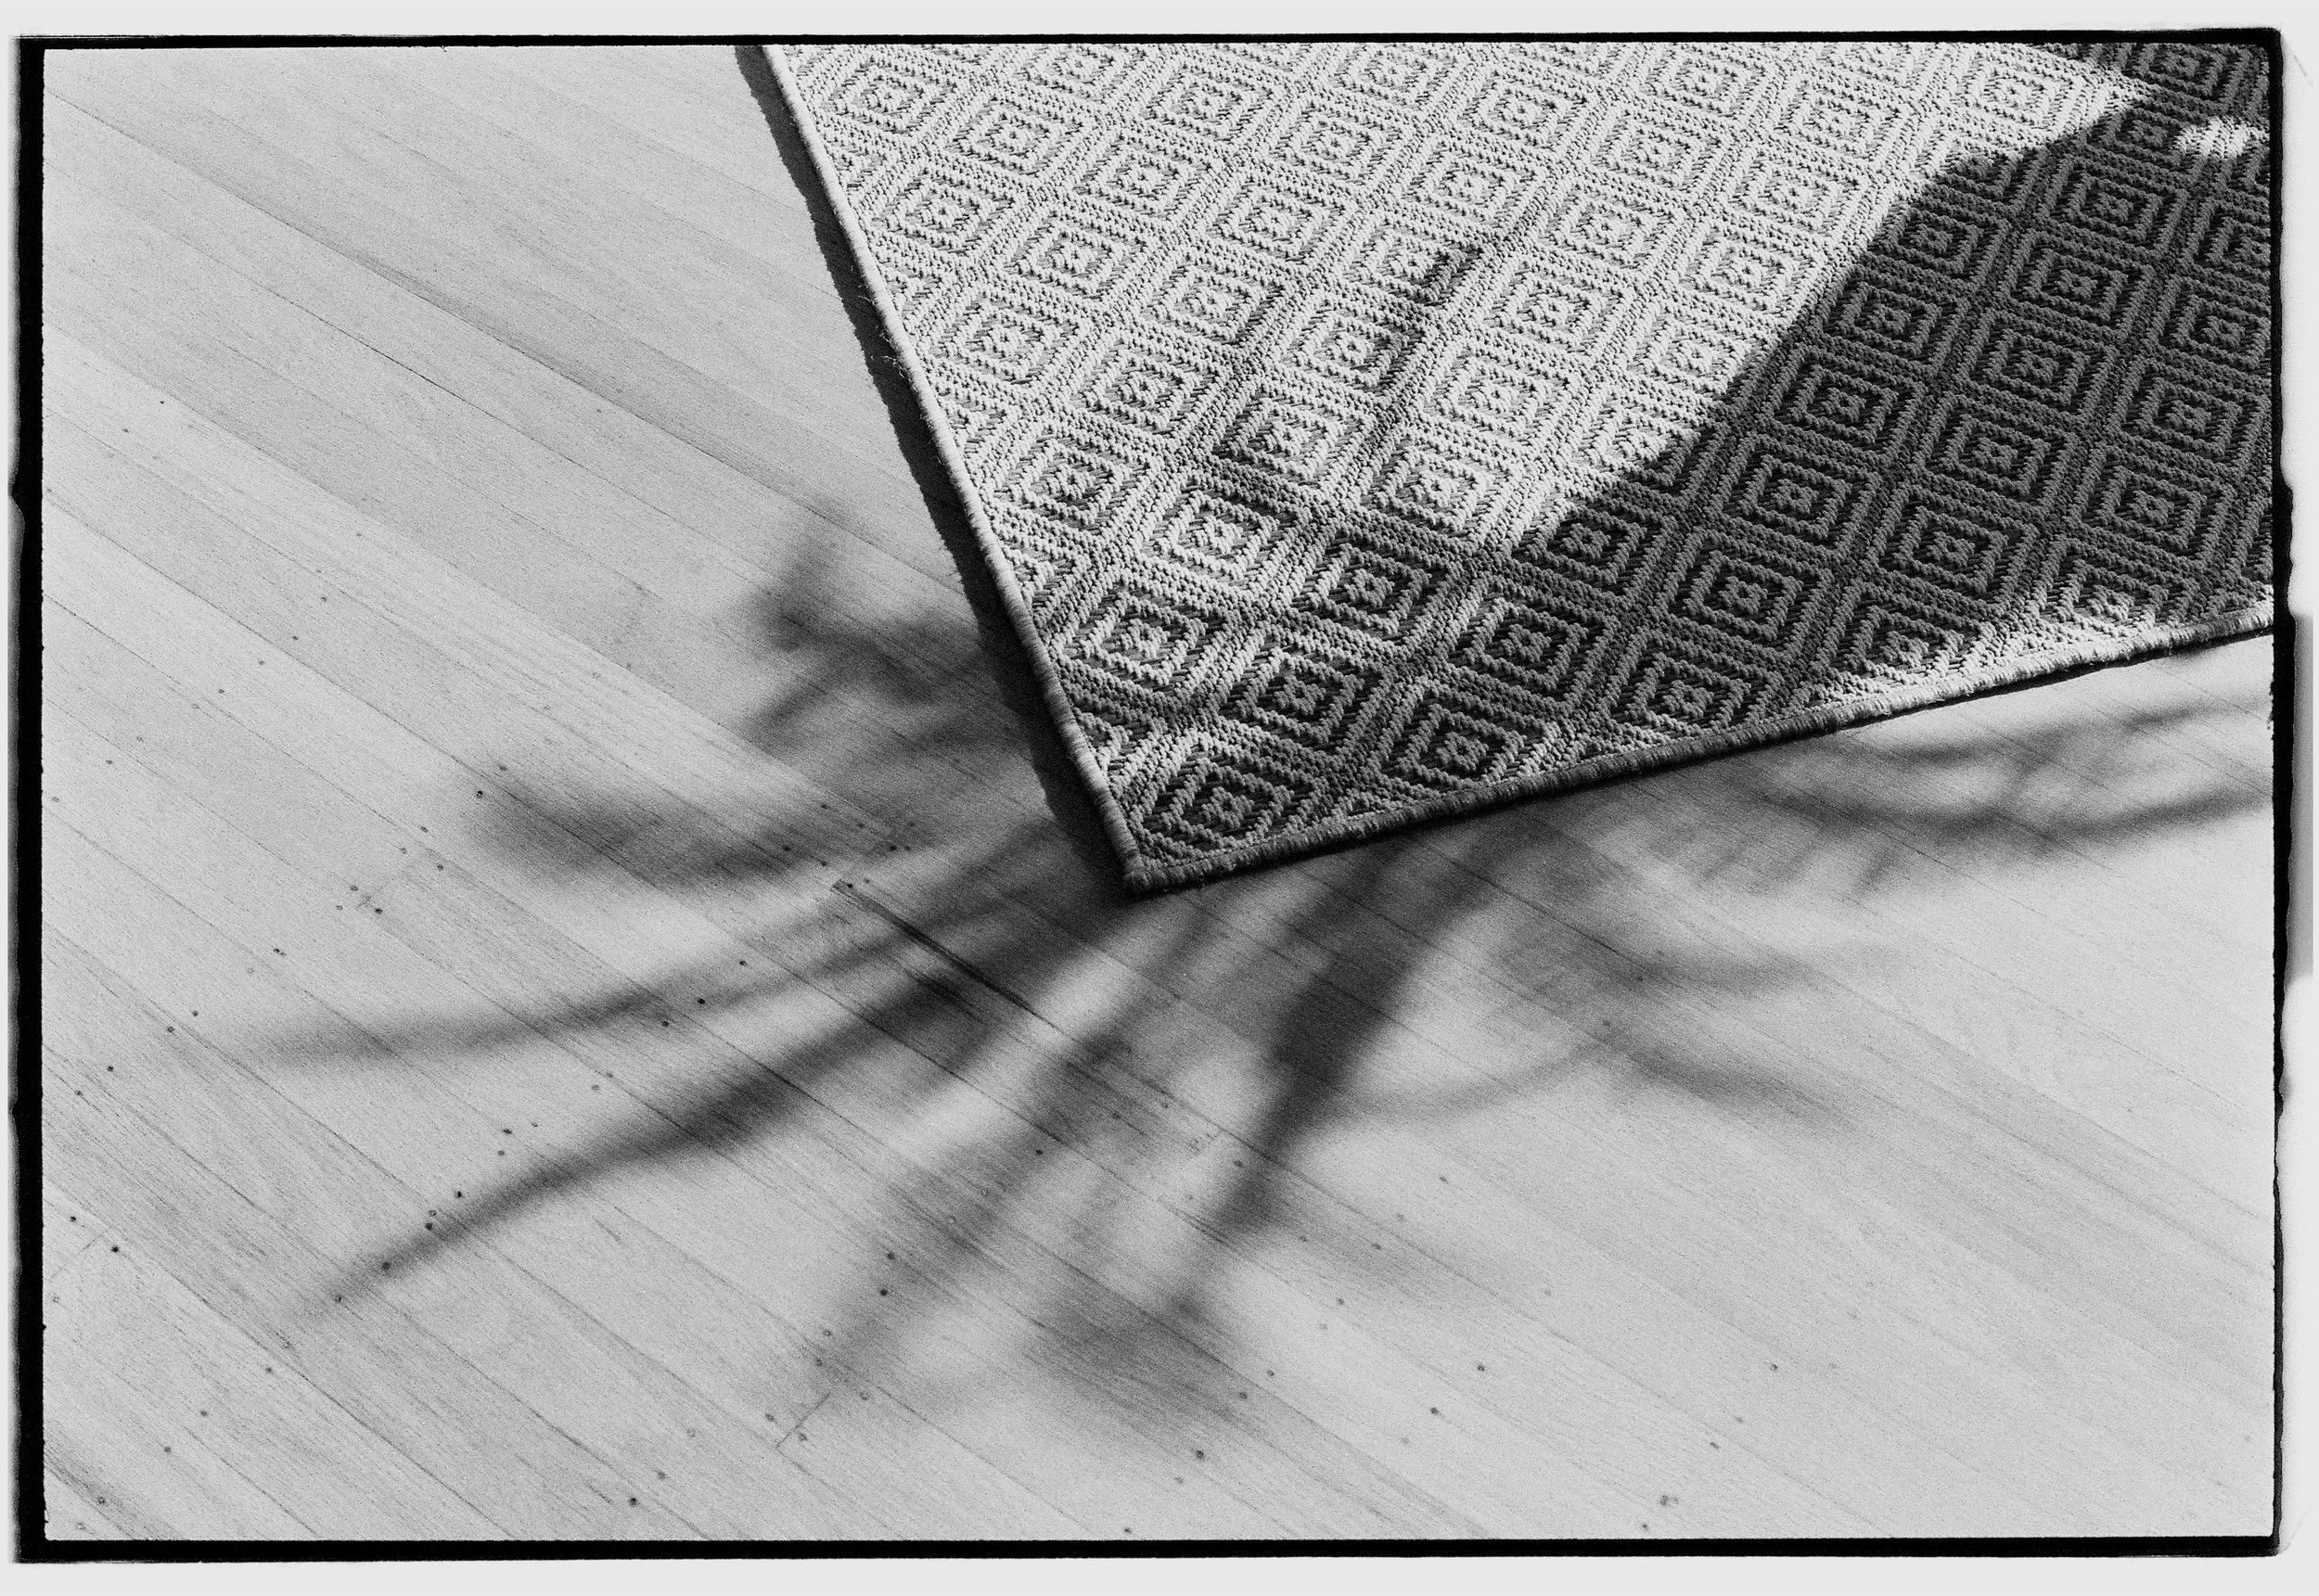 Shadows on Rug.jpg